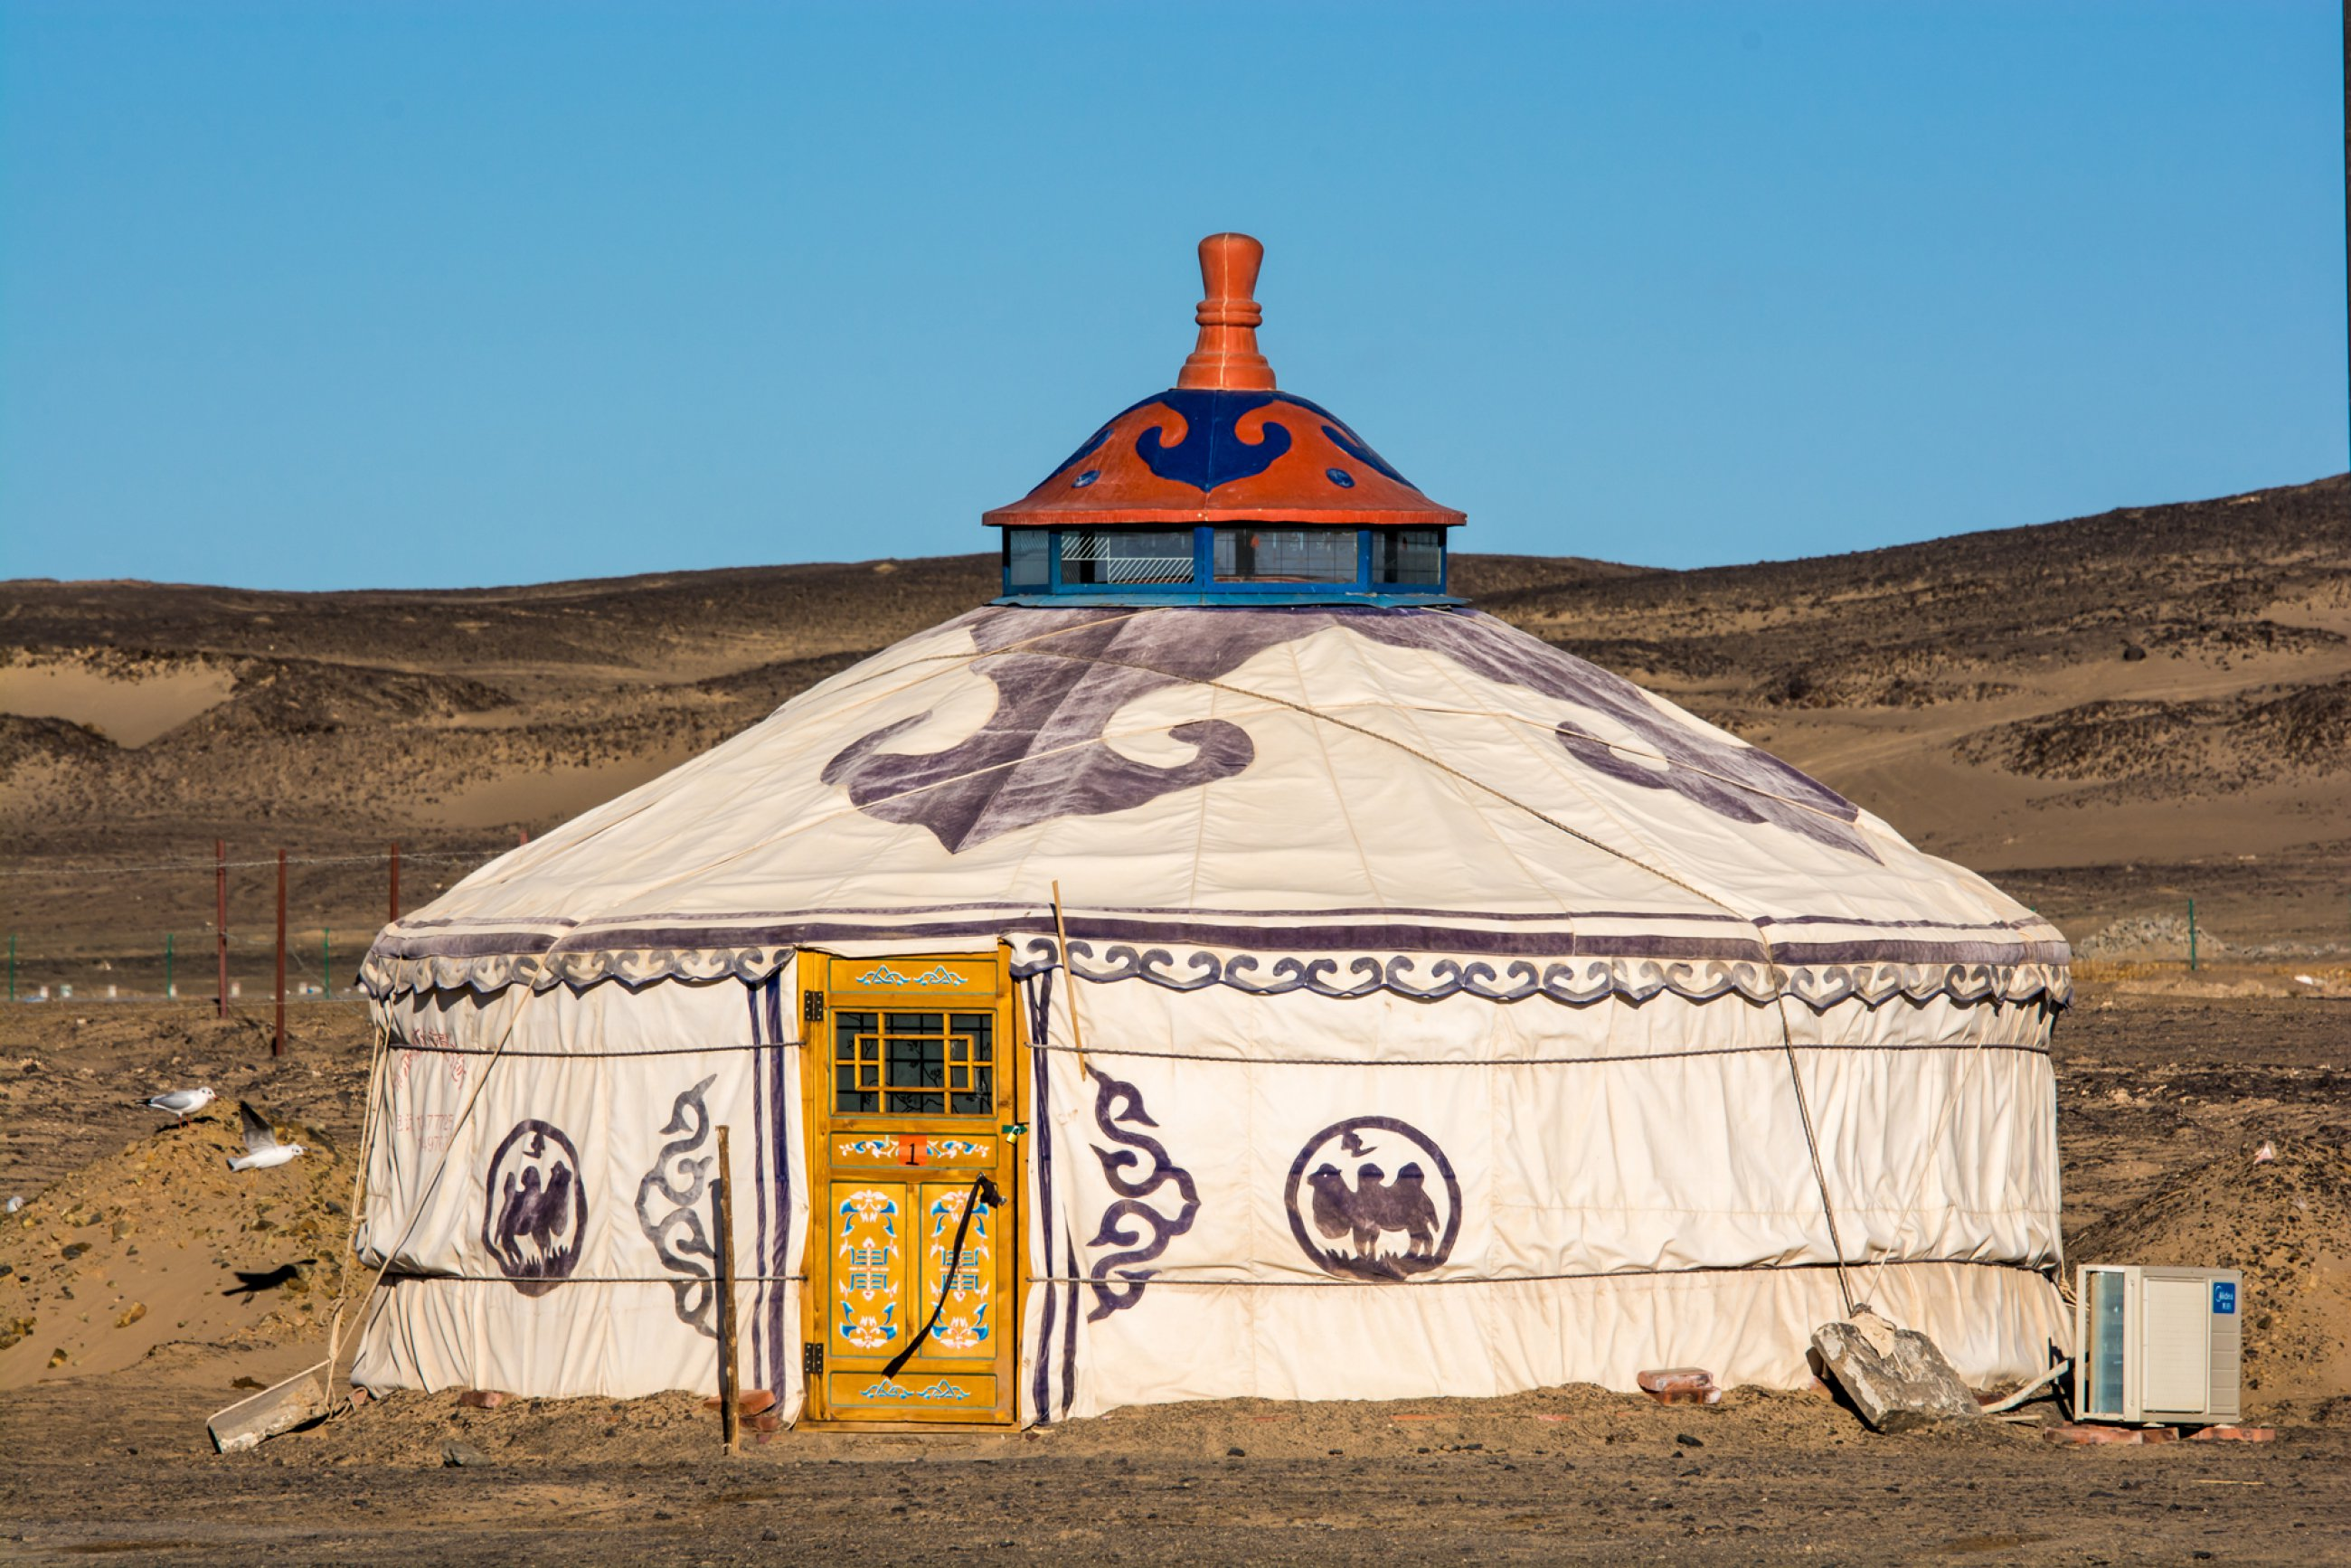 https://bubo.sk/uploads/galleries/4924/084-85-stravime-noc-v-tradicnej-mongolskej-jurte..jpg